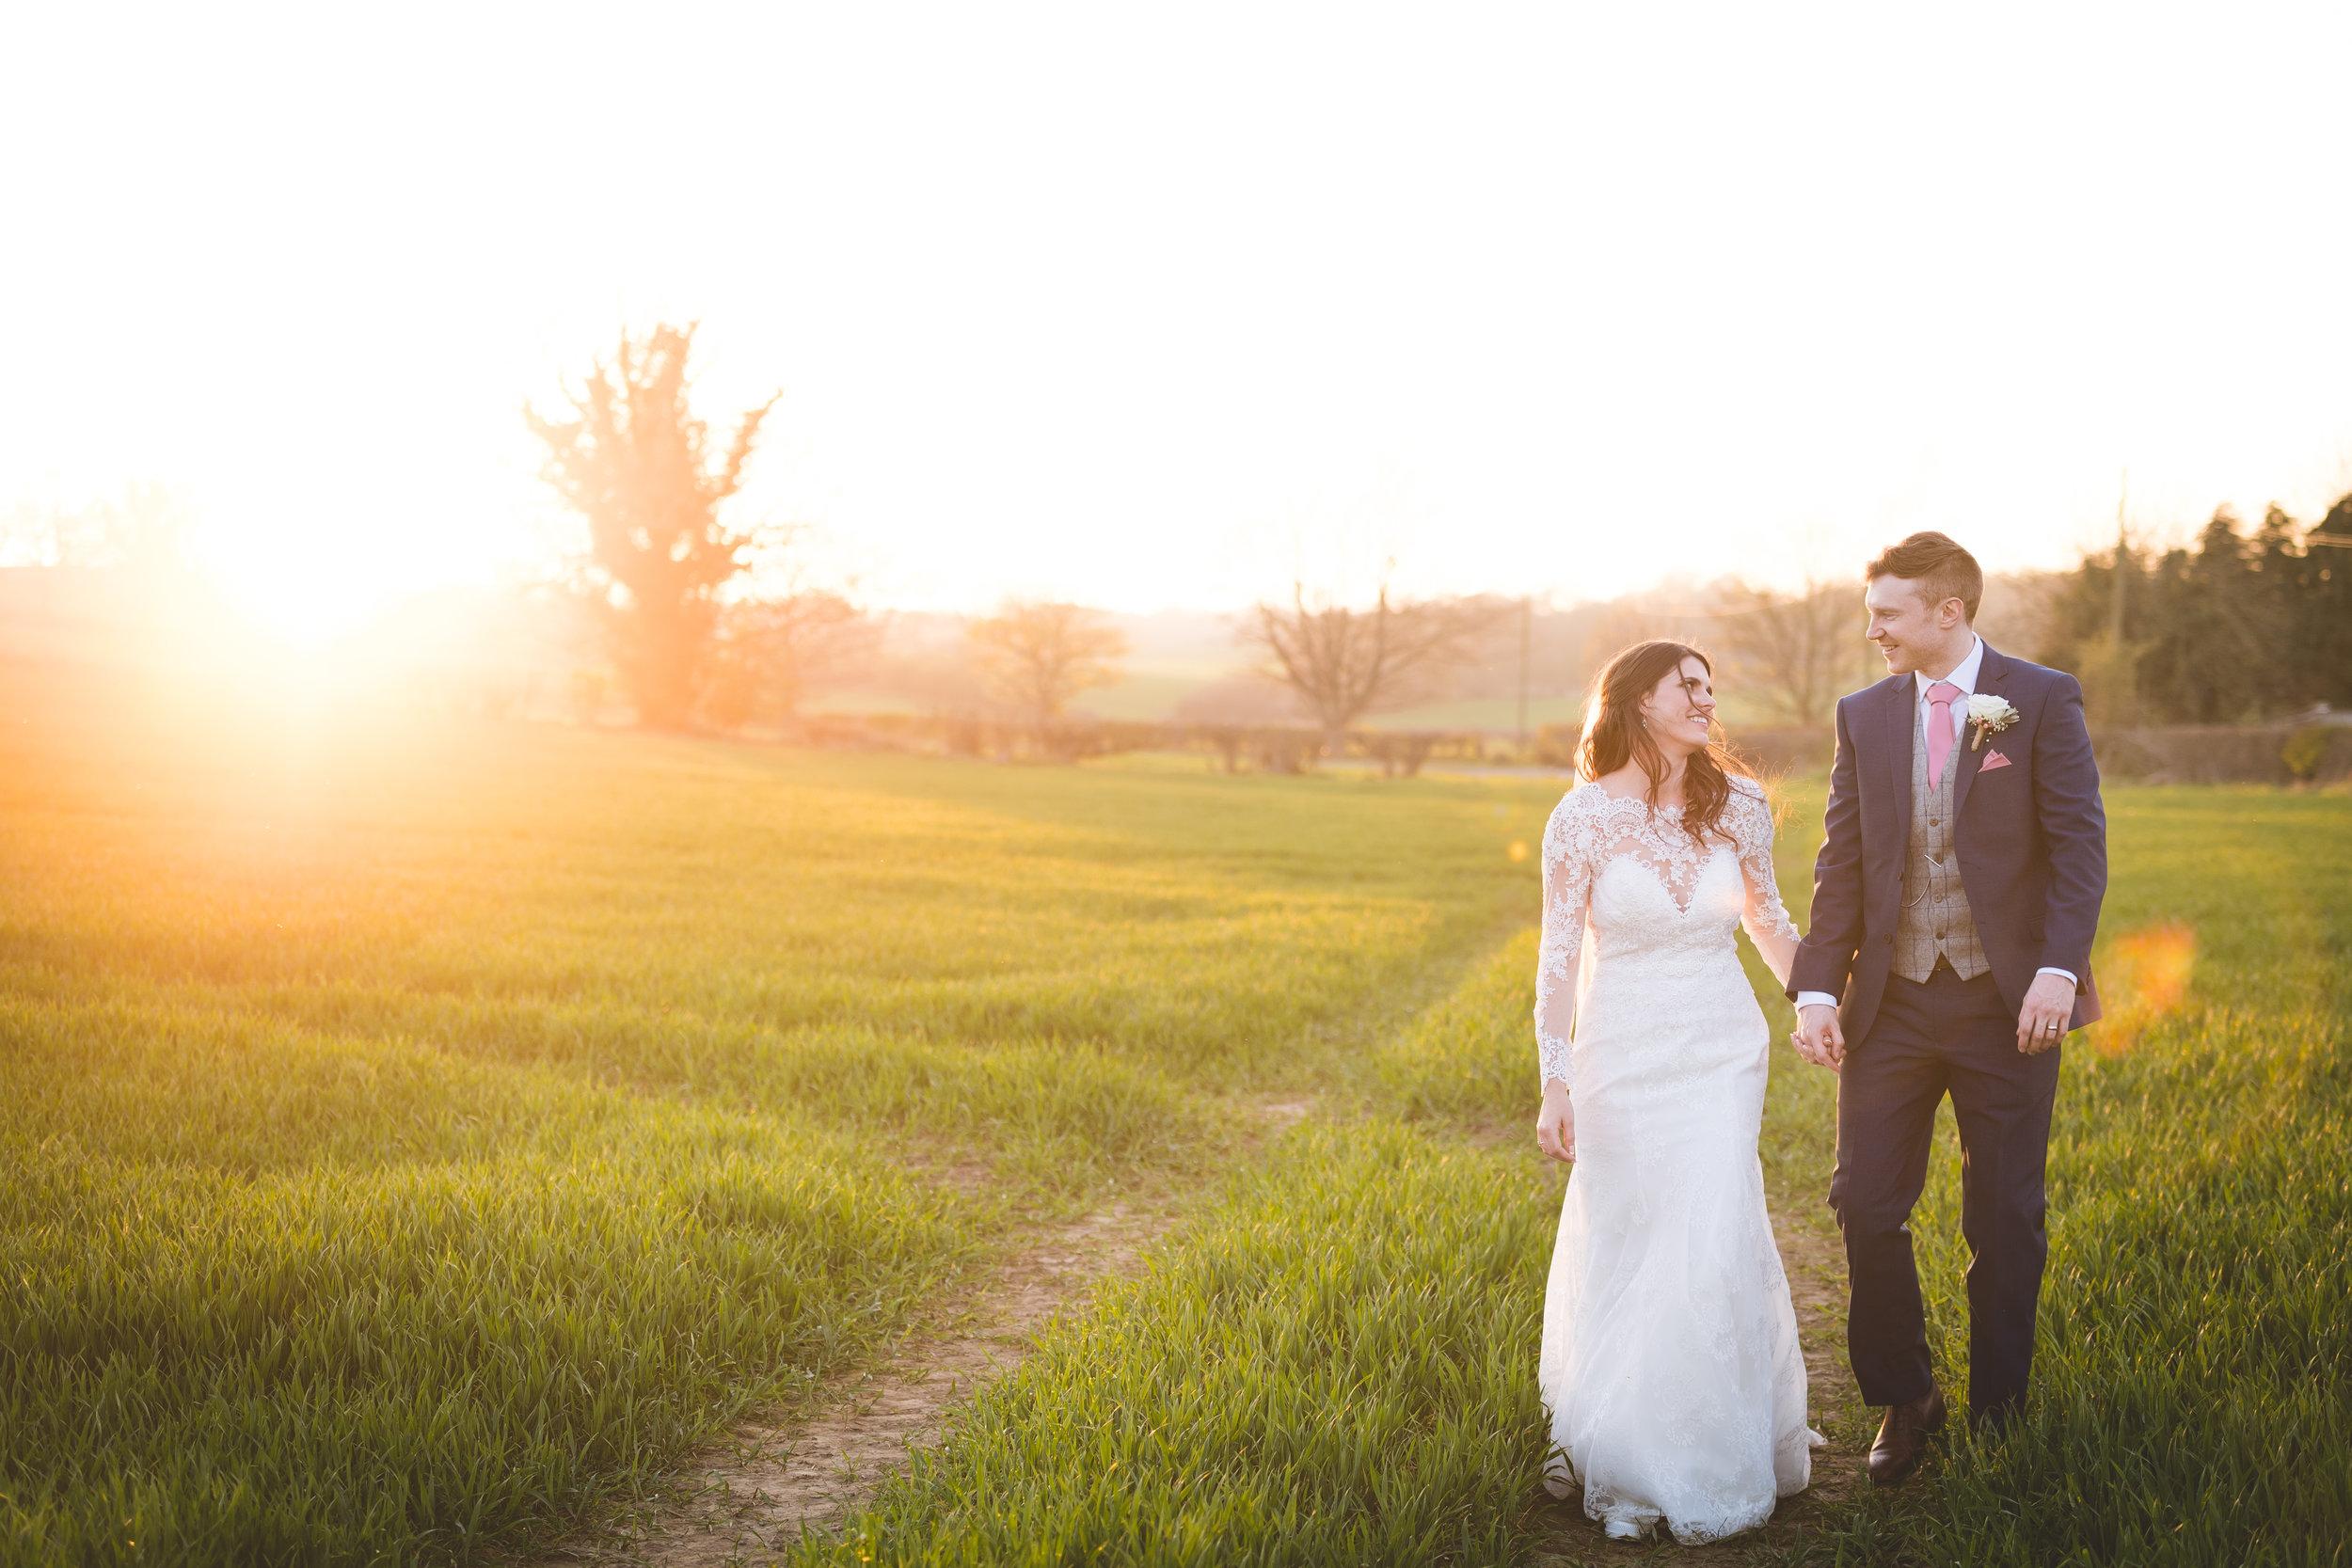 The Yorkshire Wedding Barn at Sunset